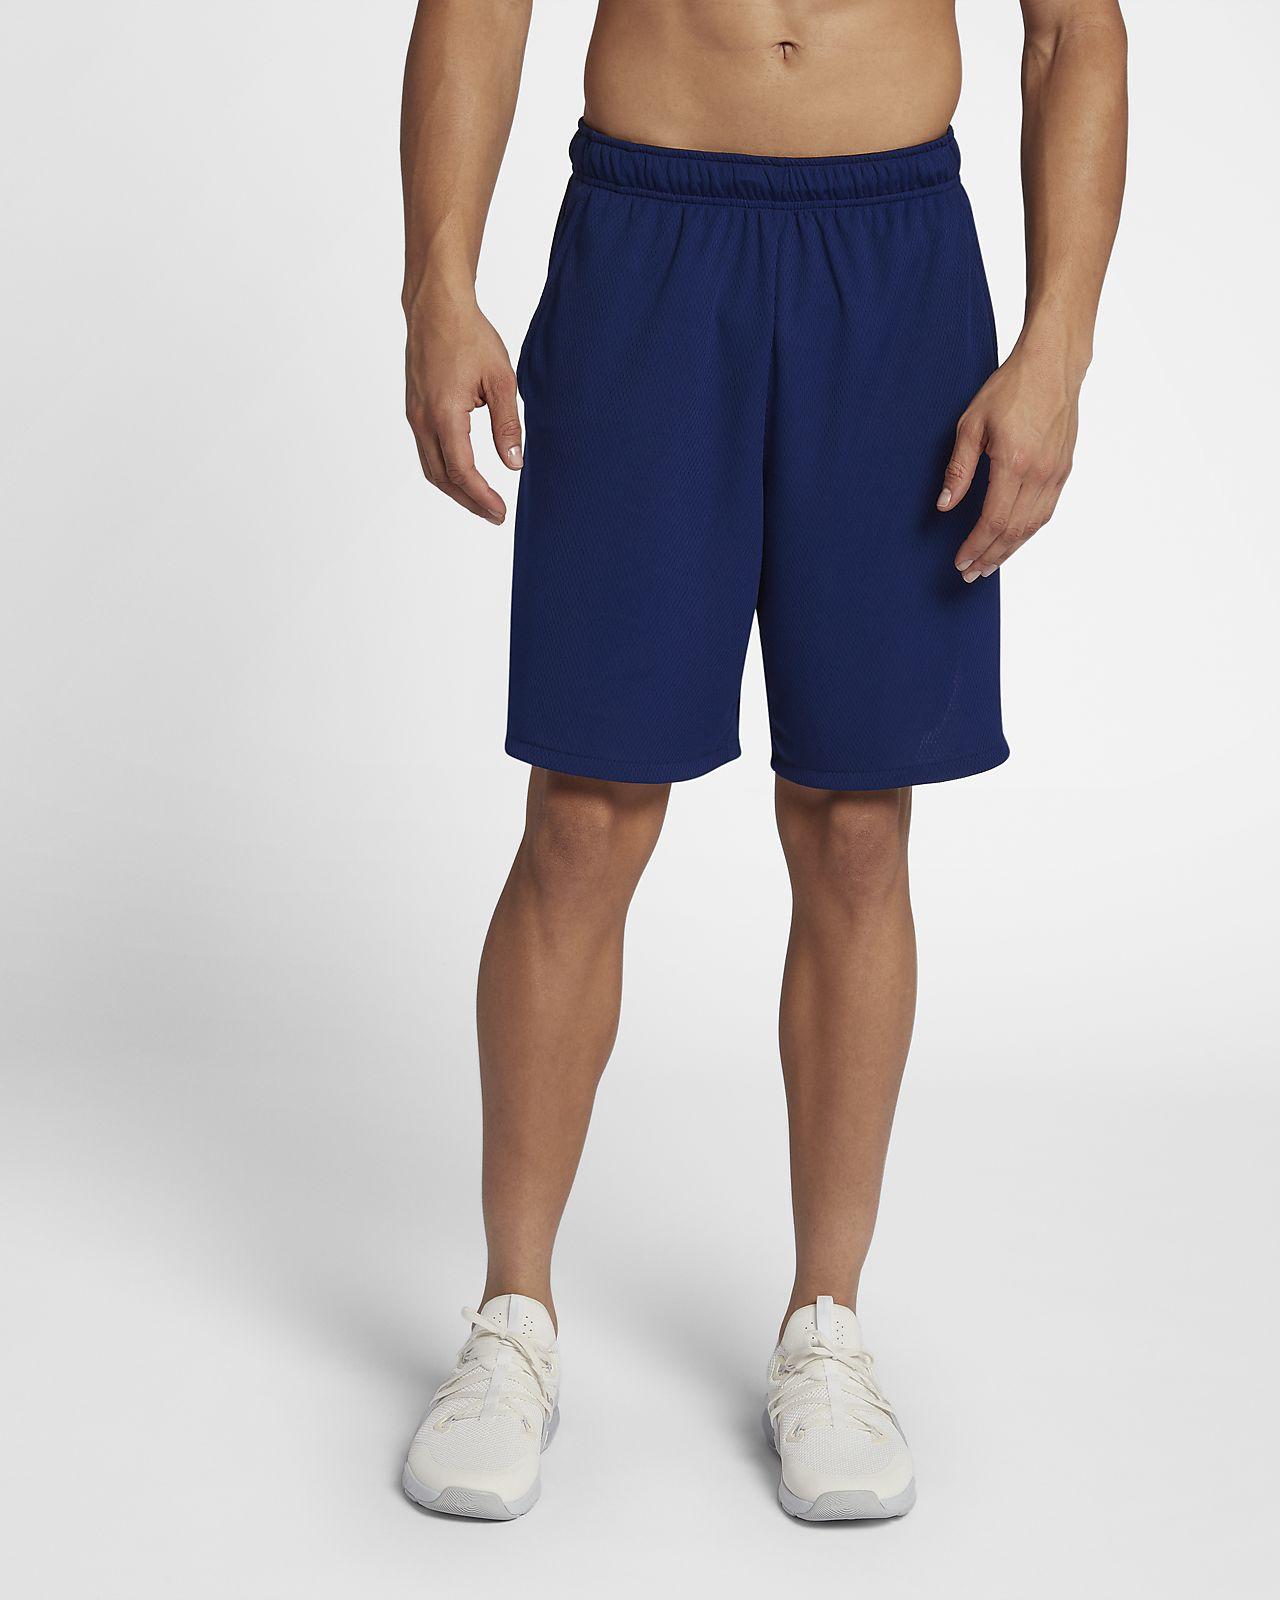 FIT Herrenca23 Nike Trainingsshorts Dri cm für Web QBtdhxsrC